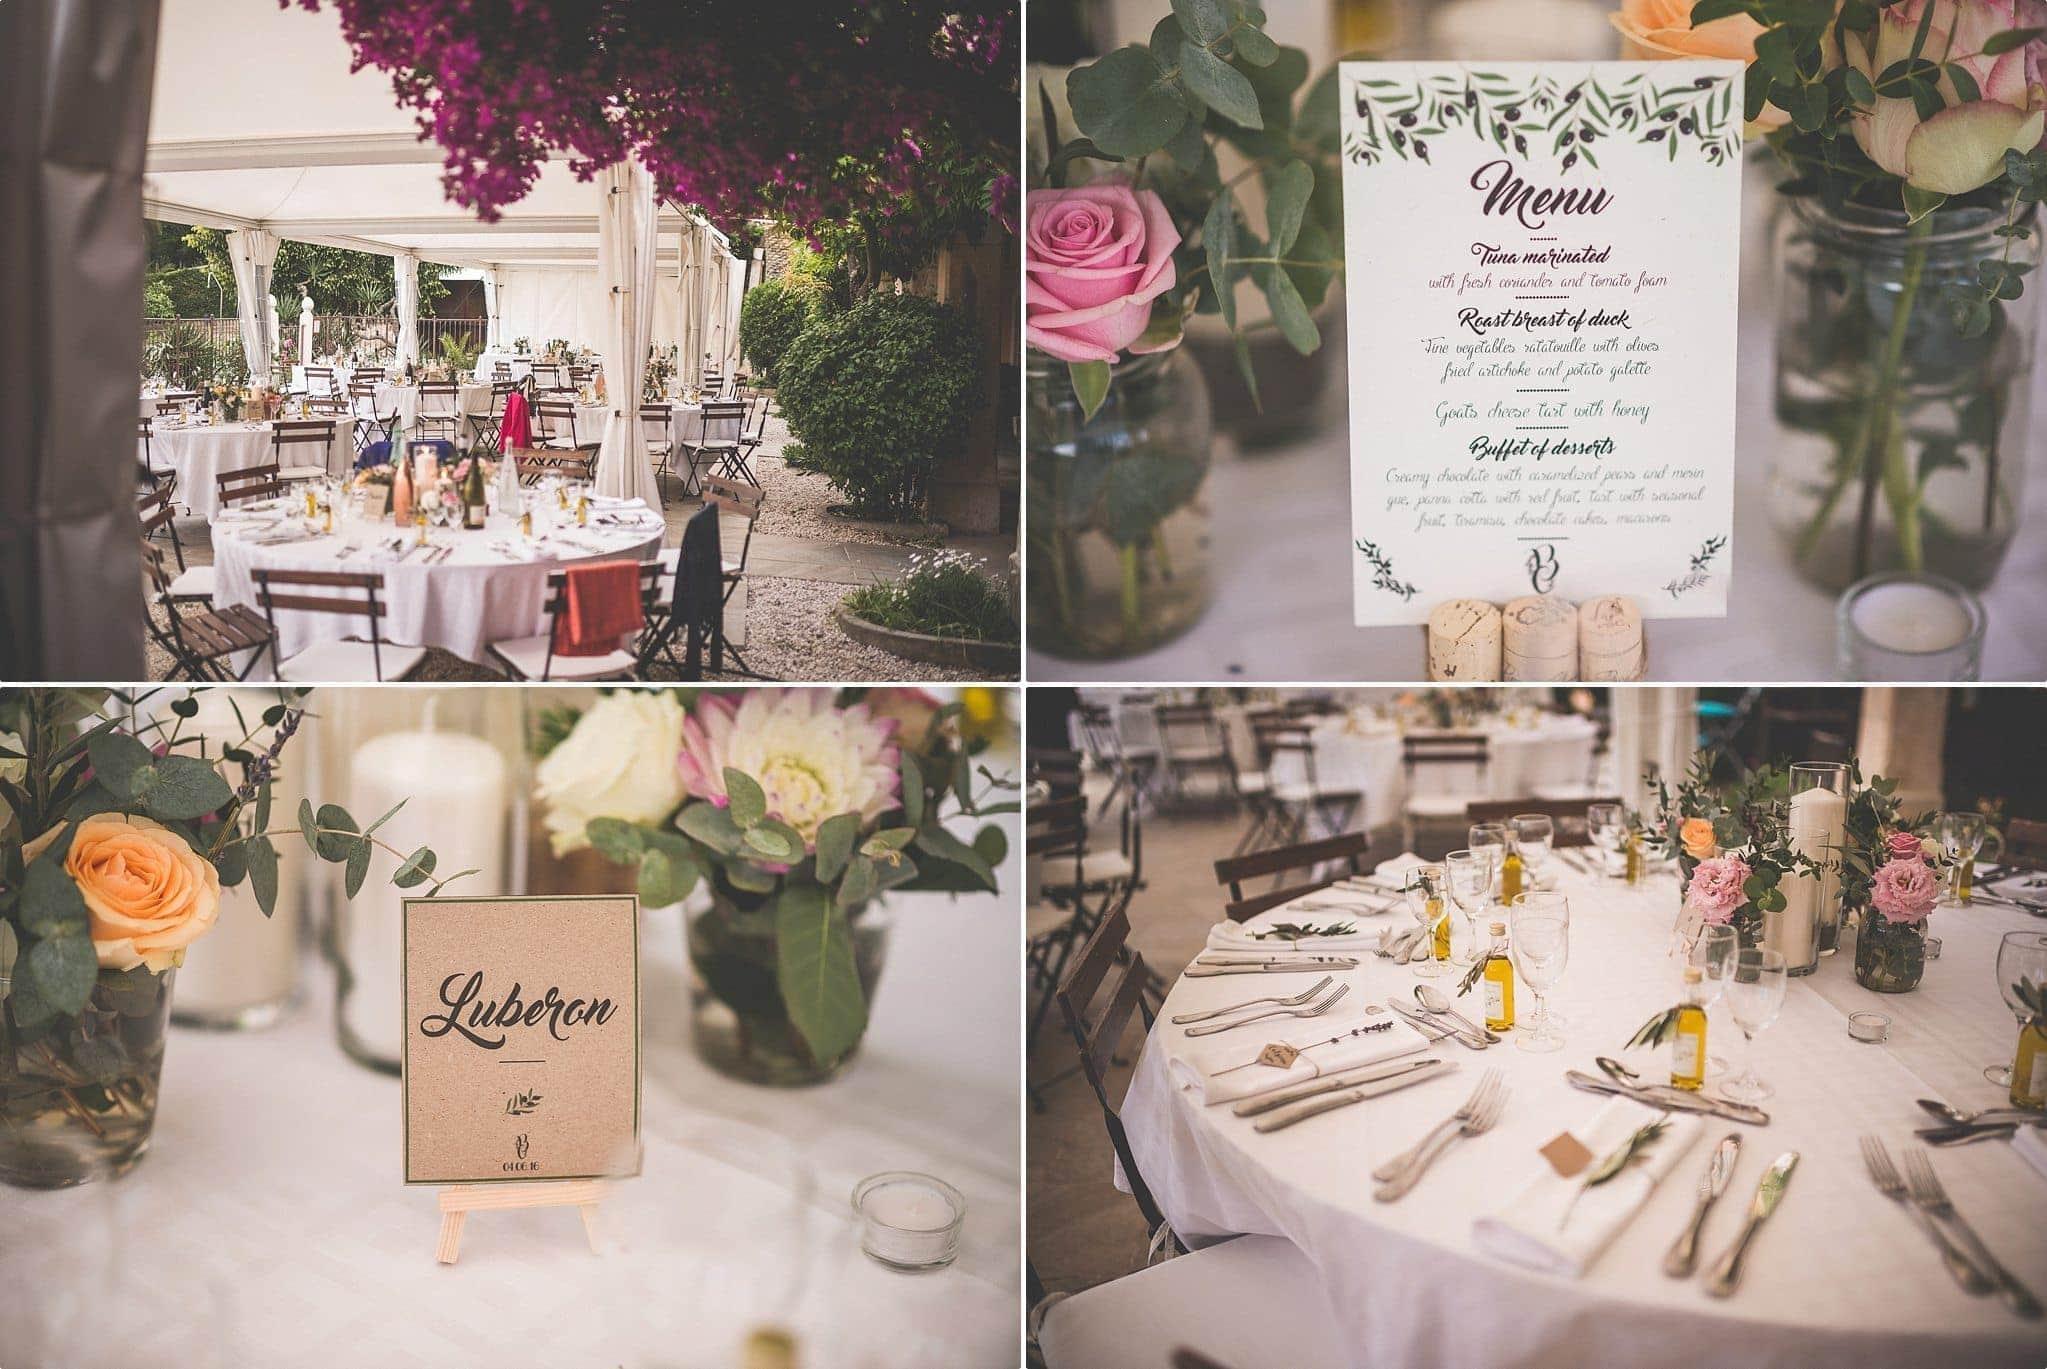 Domaine de la Croix Hotel L'Orangerie South of France vineyard and beach Wedding - Maria Assia Photography-306